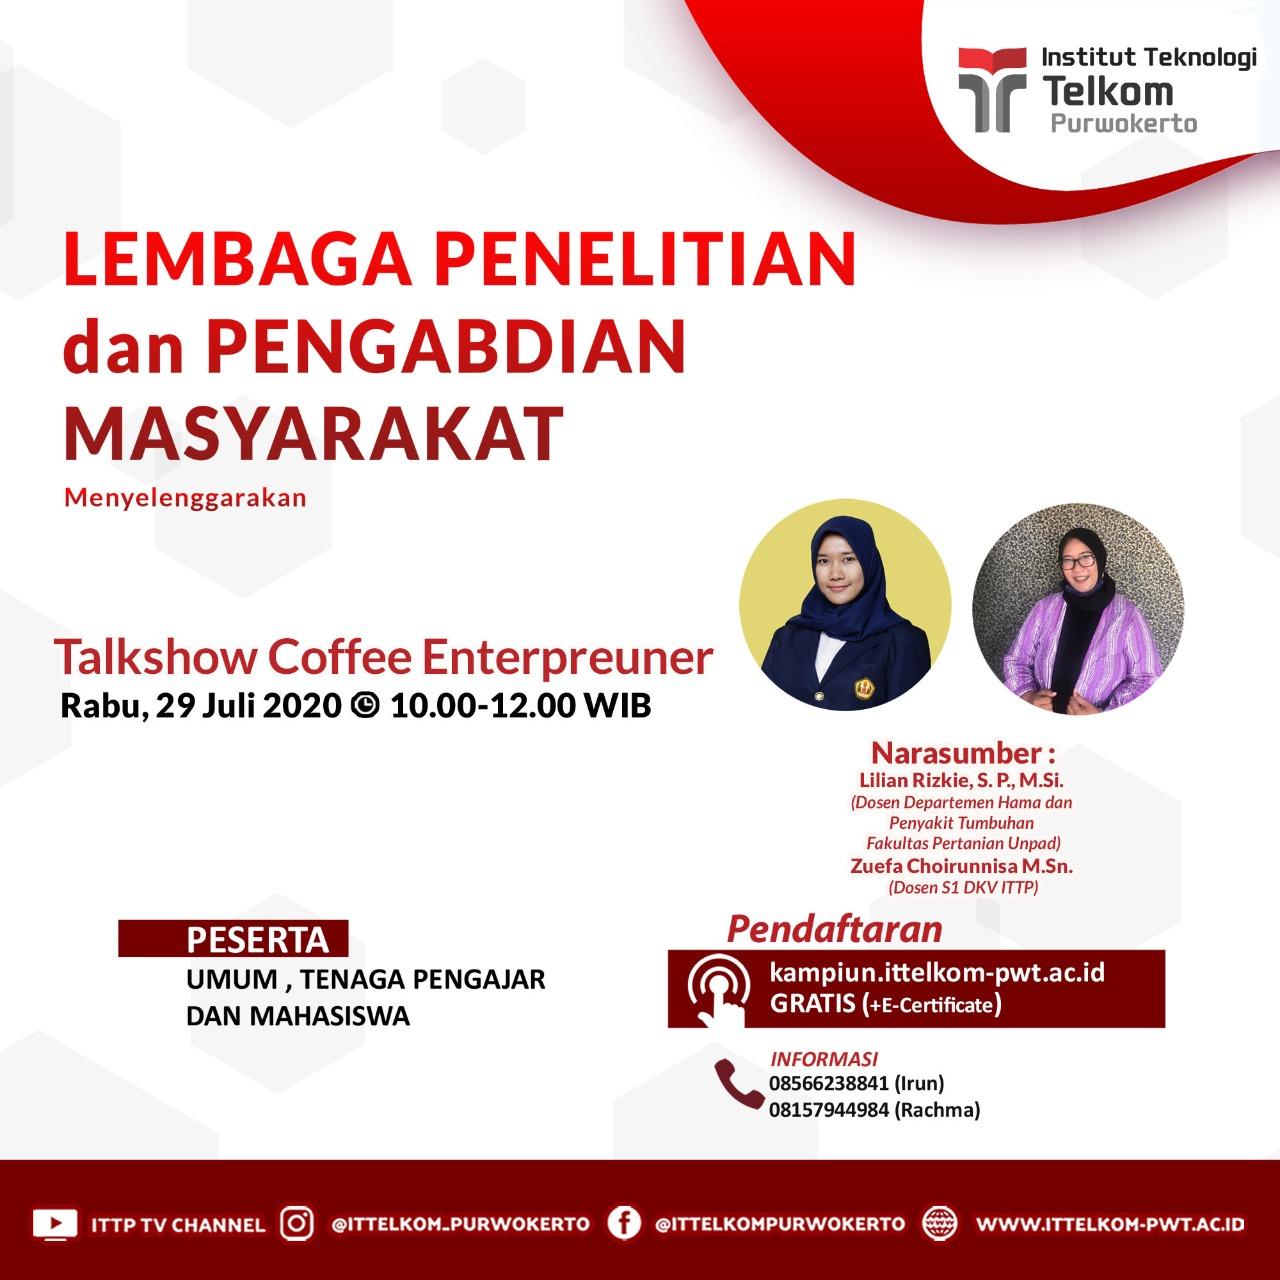 Talkshow Coffee Enterpreuner